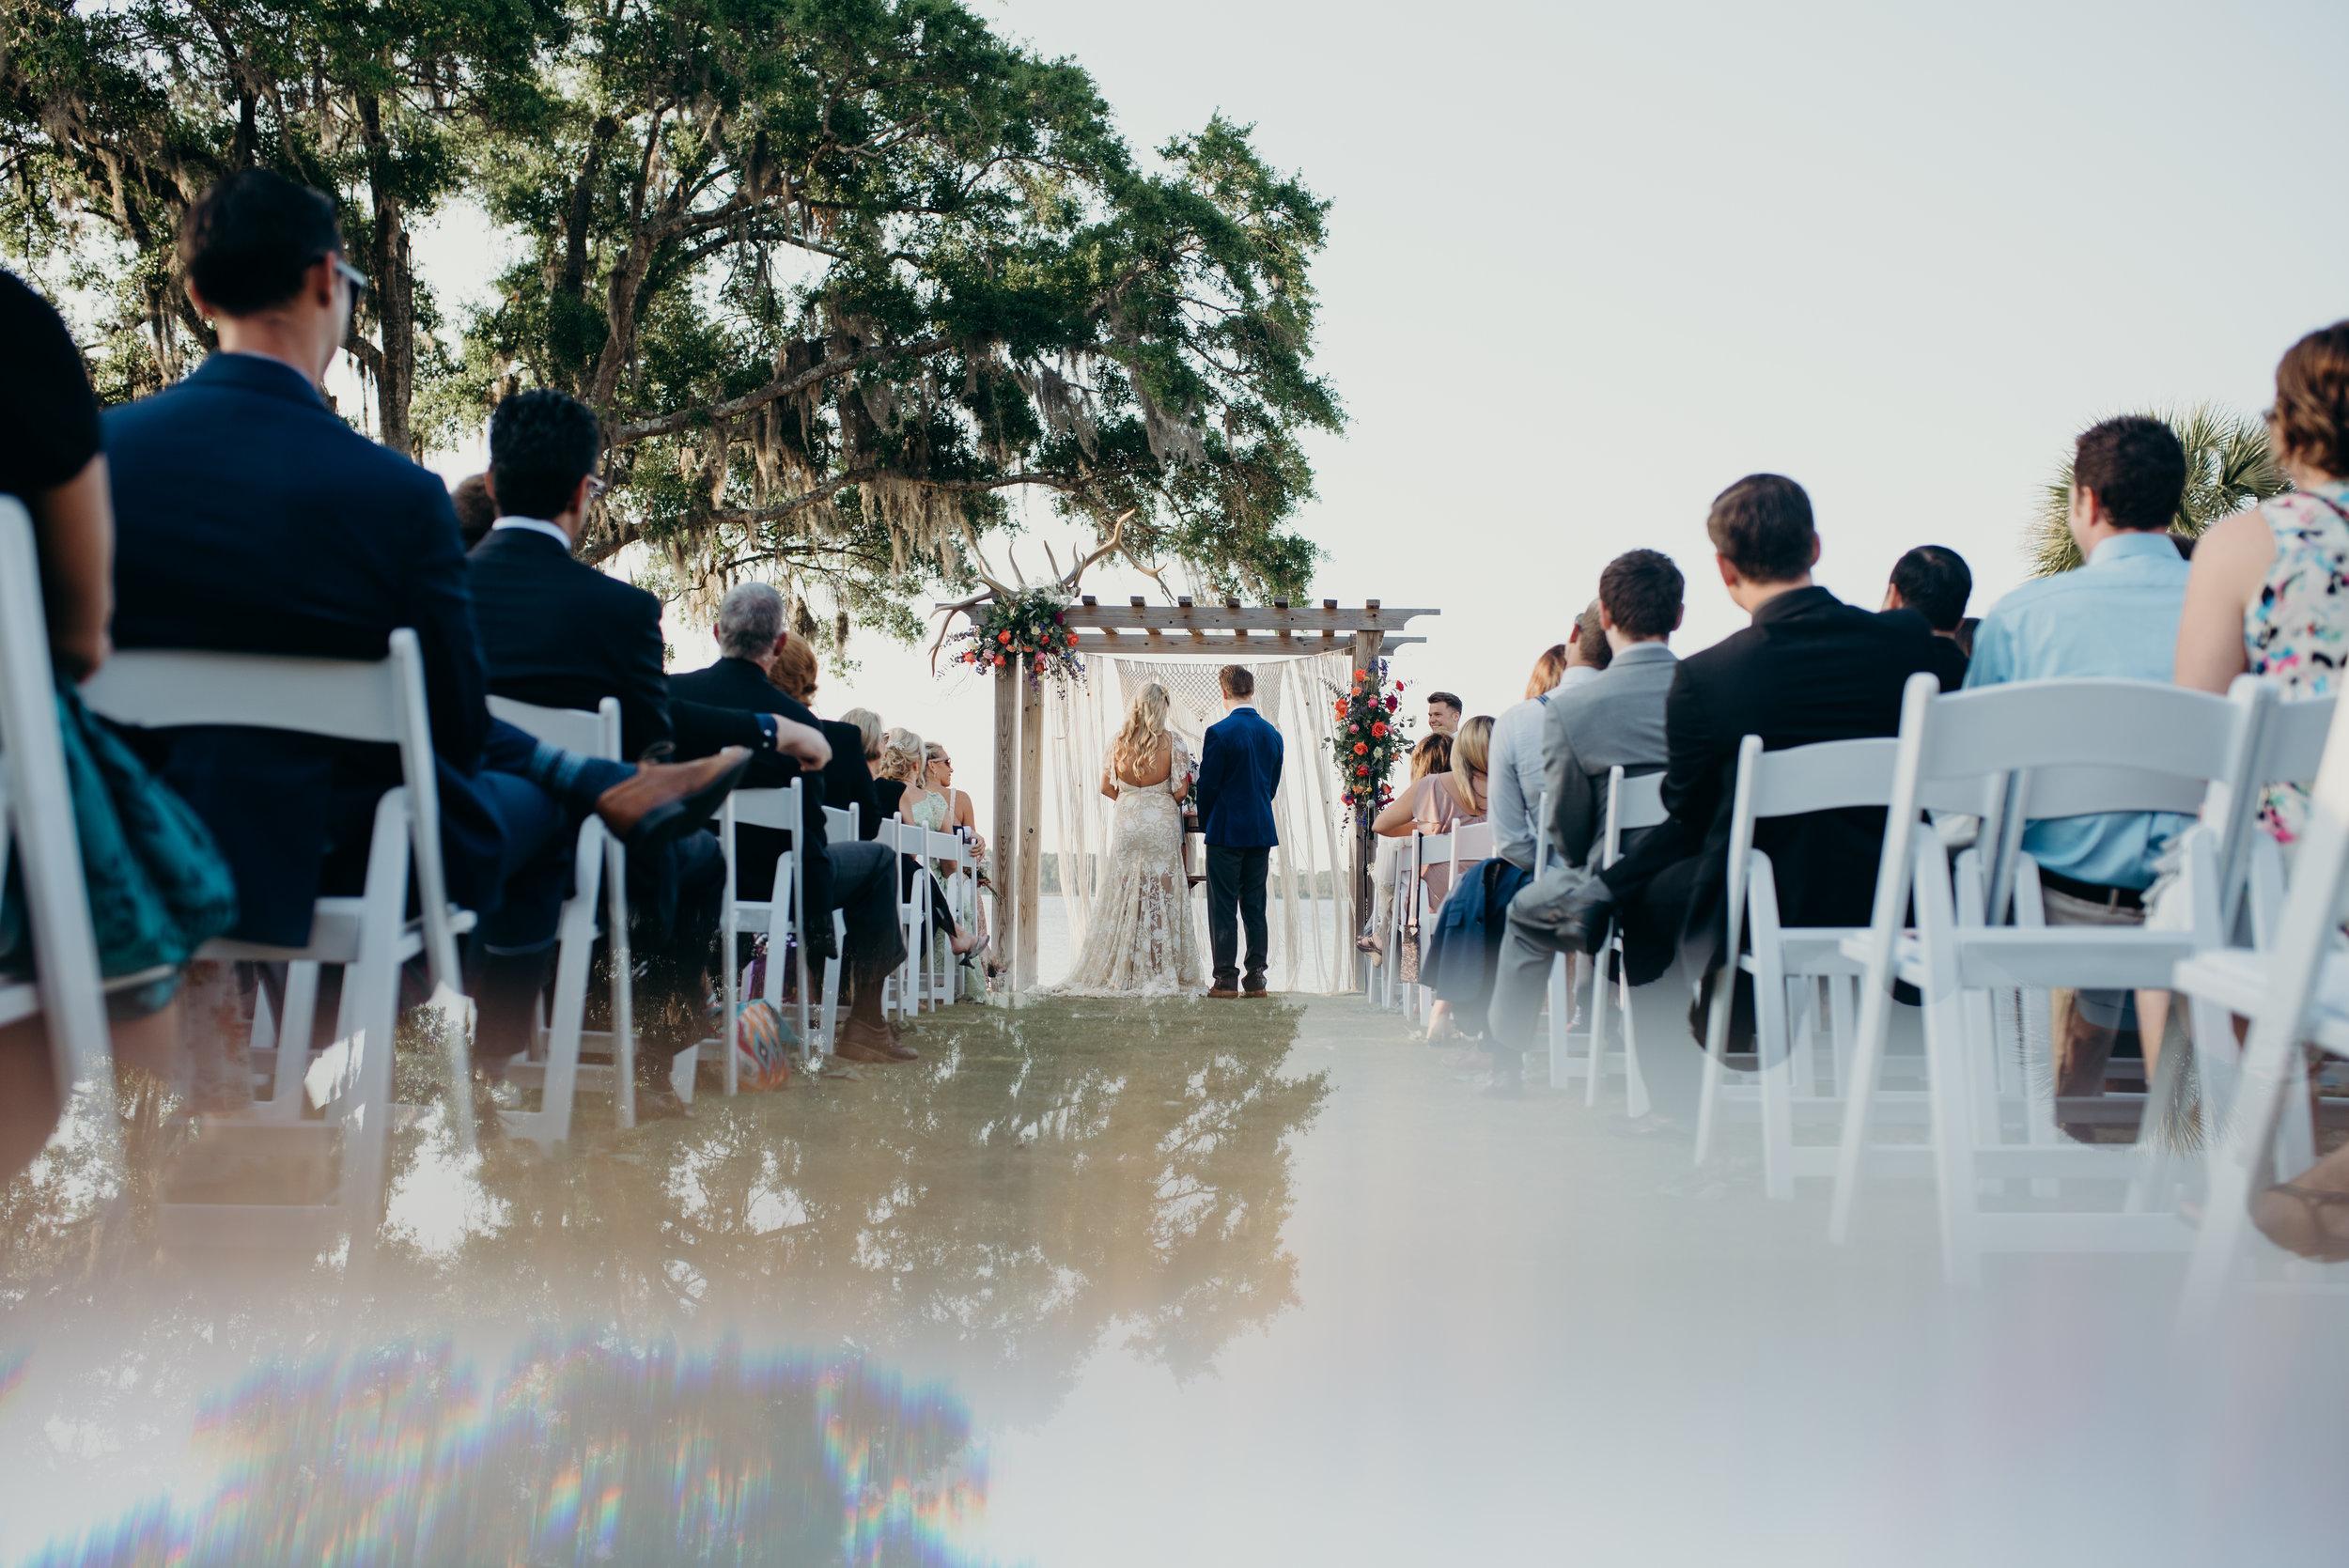 zayda-collin-panama-city-wedding-photography-trippy-bohemian-lisa-frank-wedding-ceremony-153.jpg